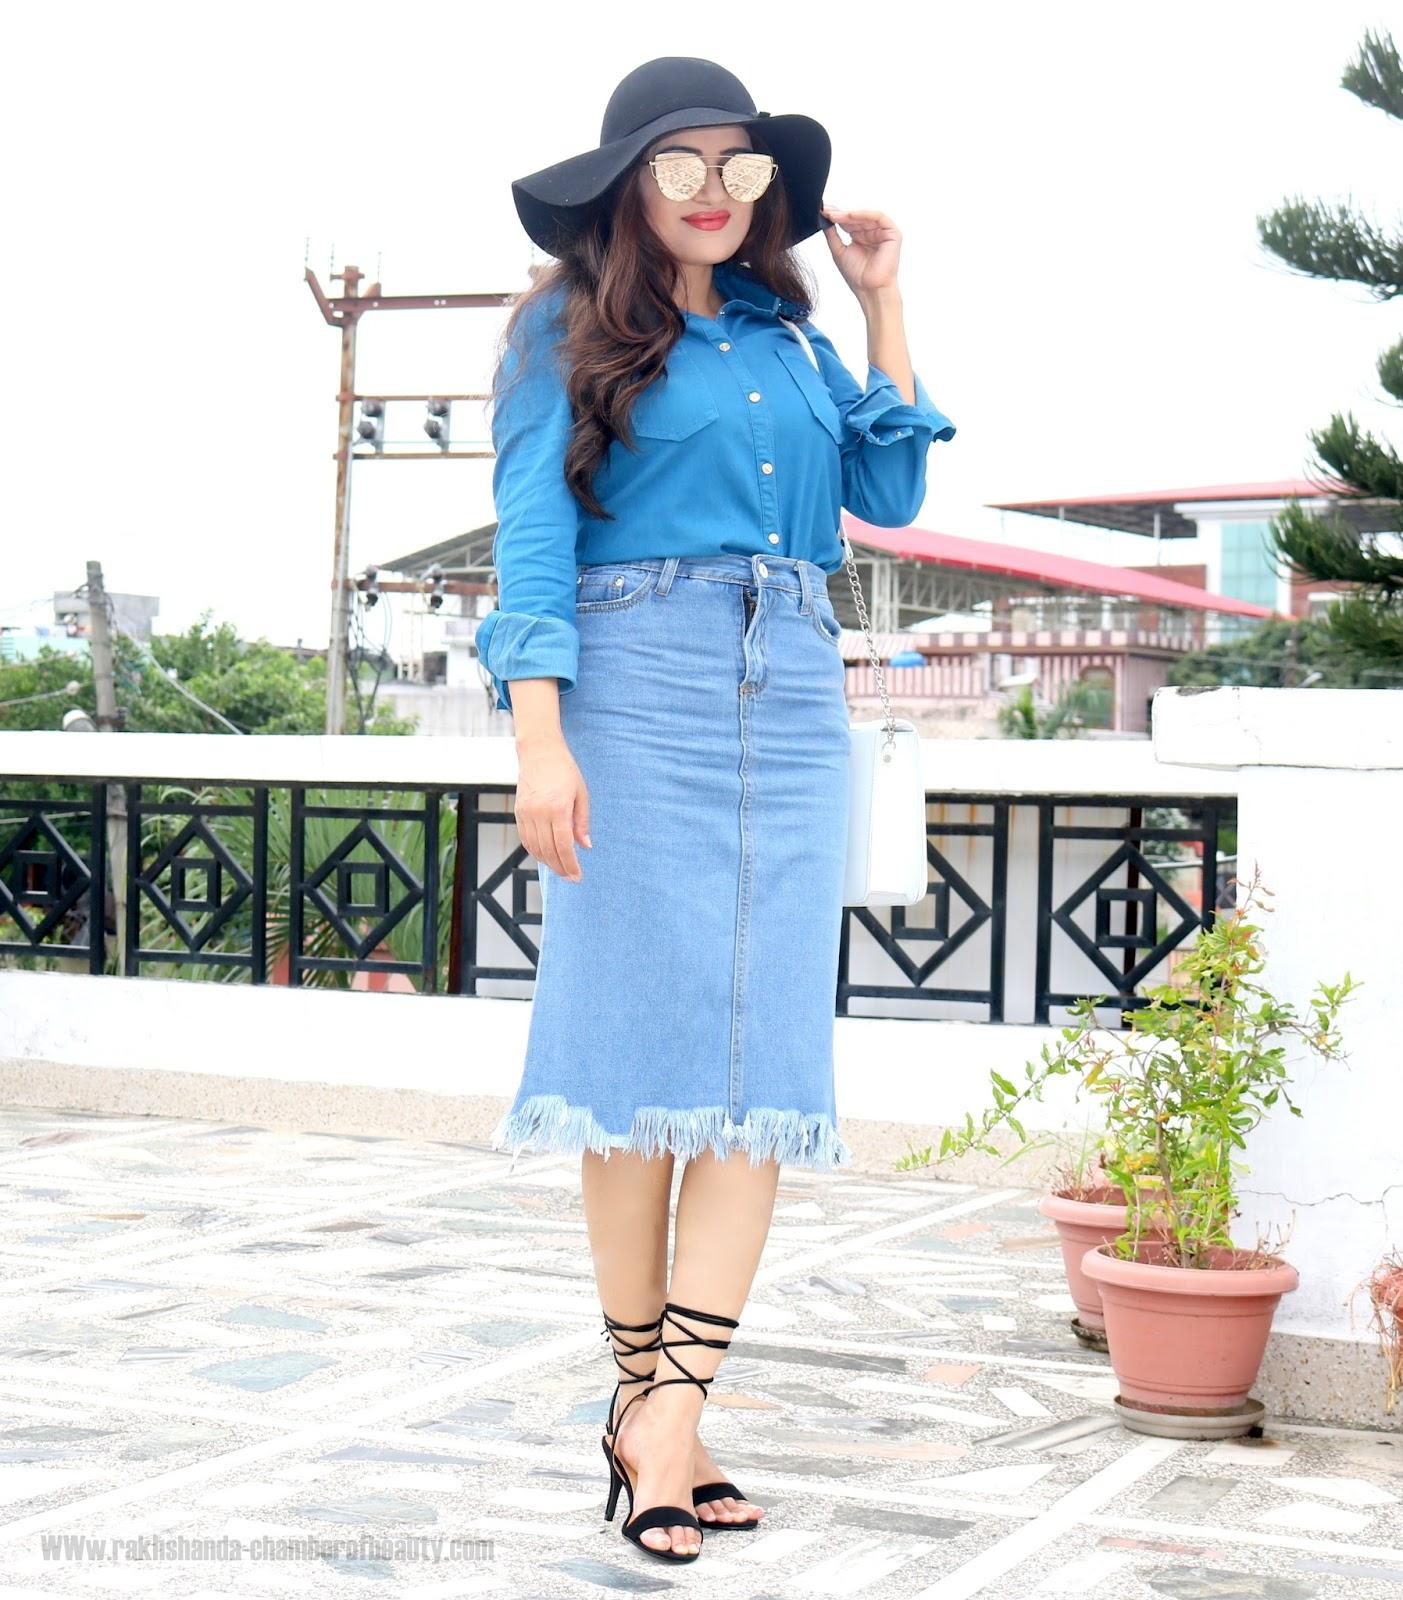 Blue Shirt + Denim Skirt Fall Fashion Trendsautumn outfit, Blue Embroidered collar shirt, fall fashion, fashion, How to style a blue shirt, Indian fashion blogger